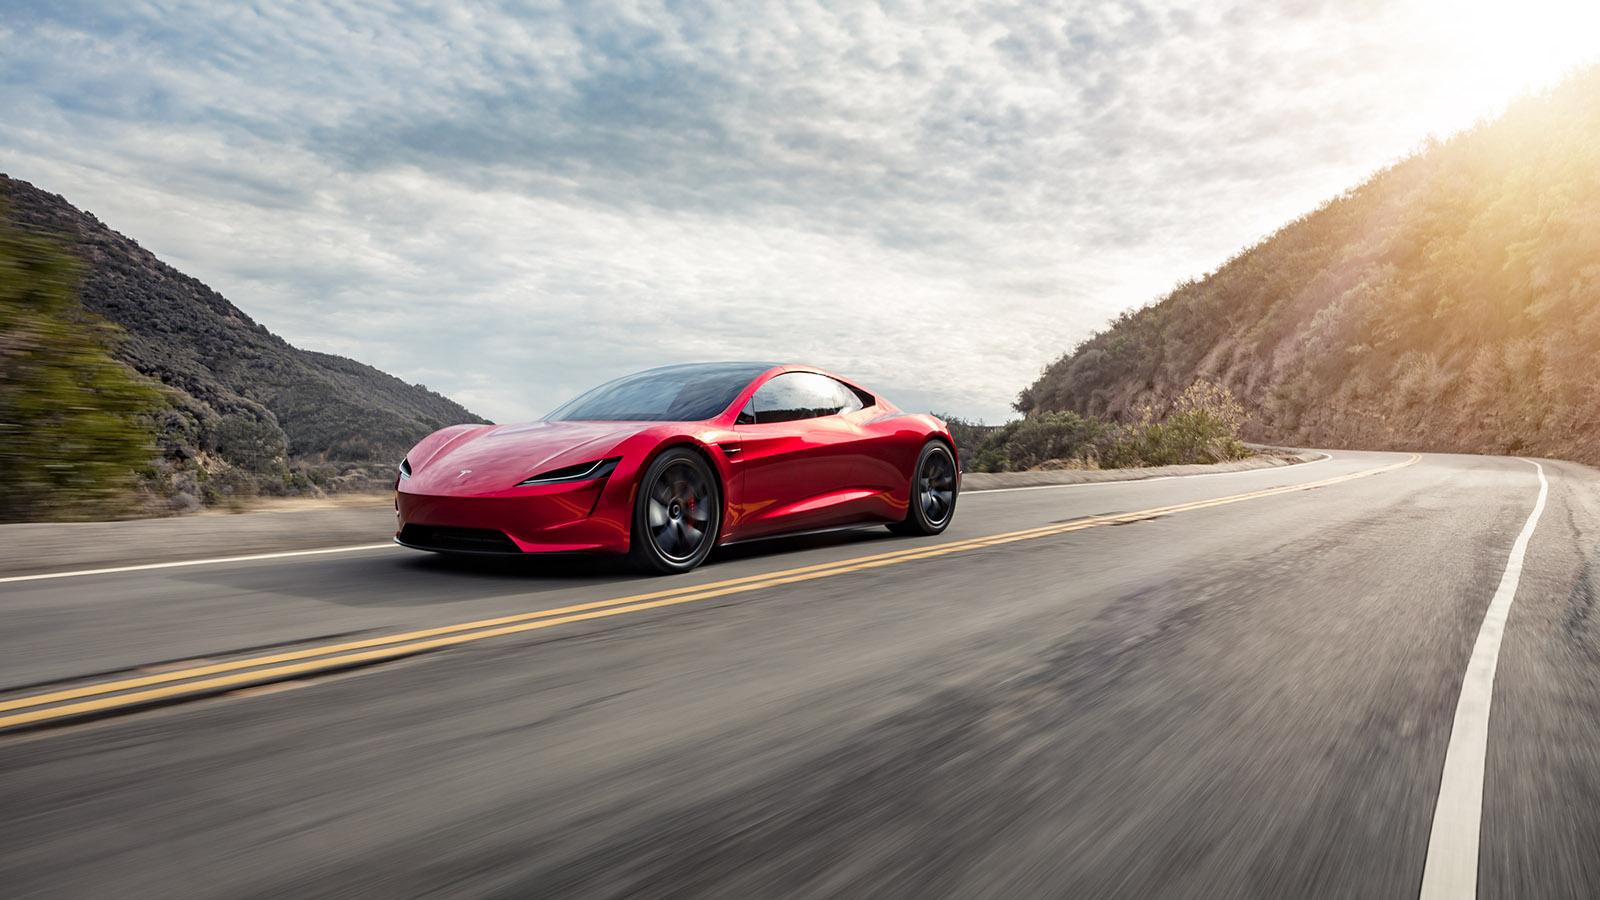 Tesla Roadster on Road